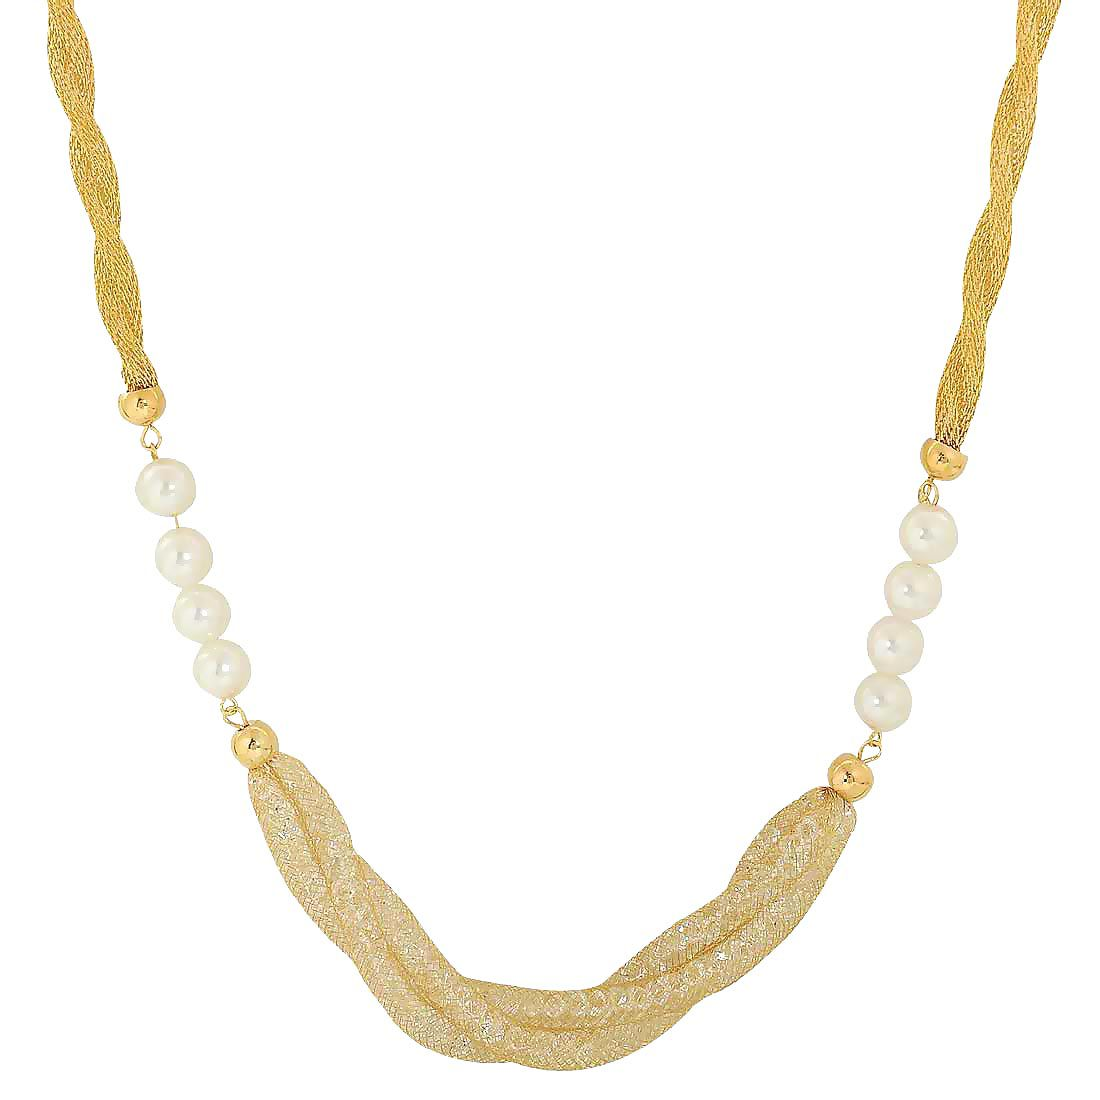 Maayra American Diamond Neckpiece White Pearl shape Party Neckpiece